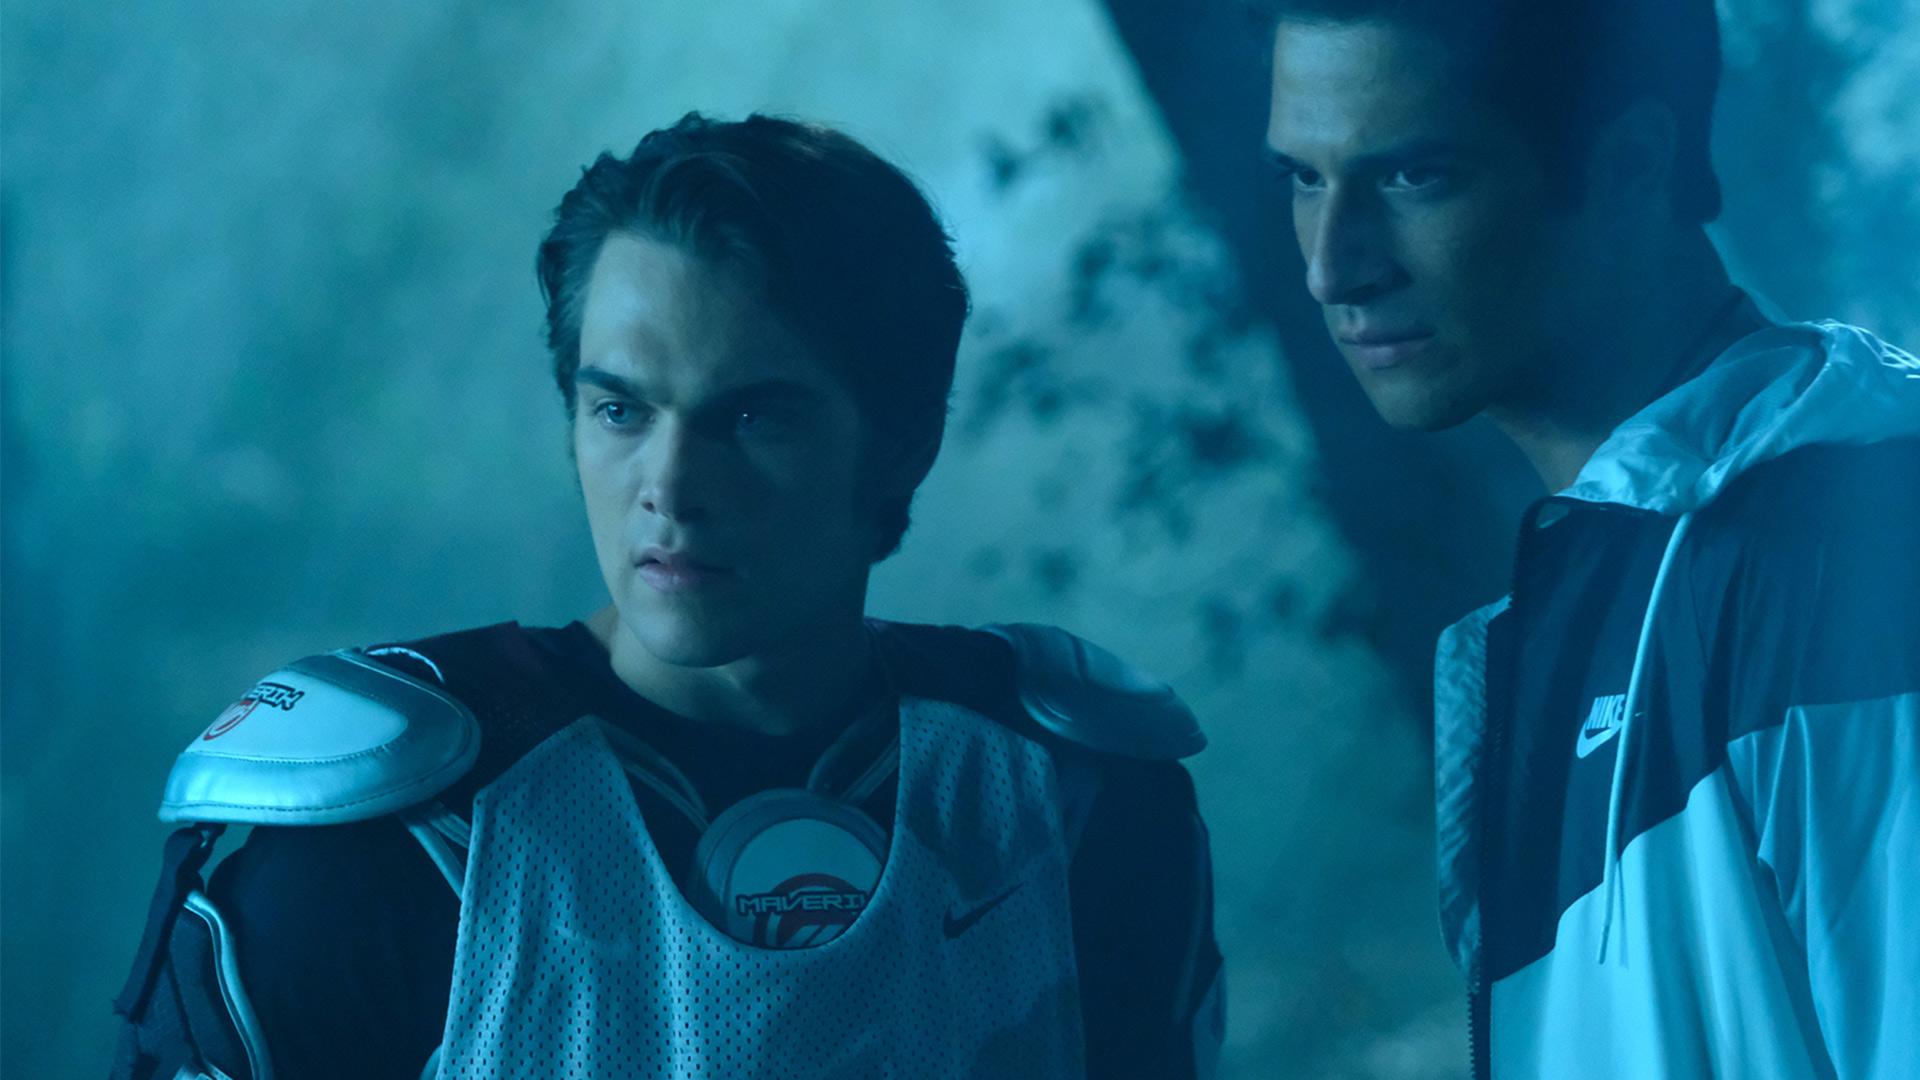 watch teen wolf season 6 episode 8 free online